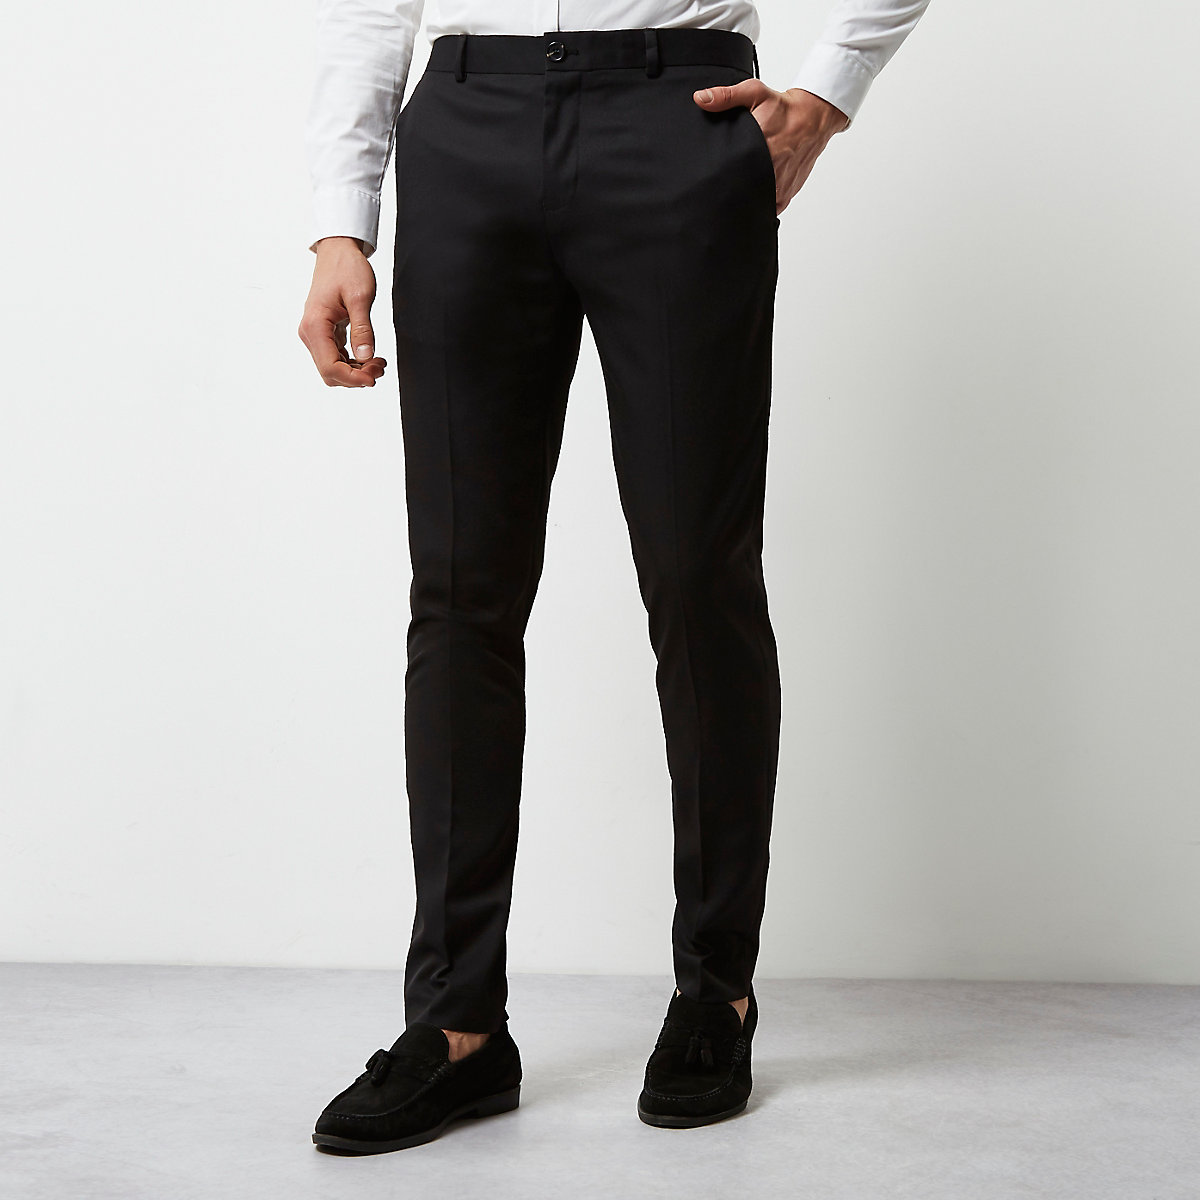 Black smart skinny fit trousers